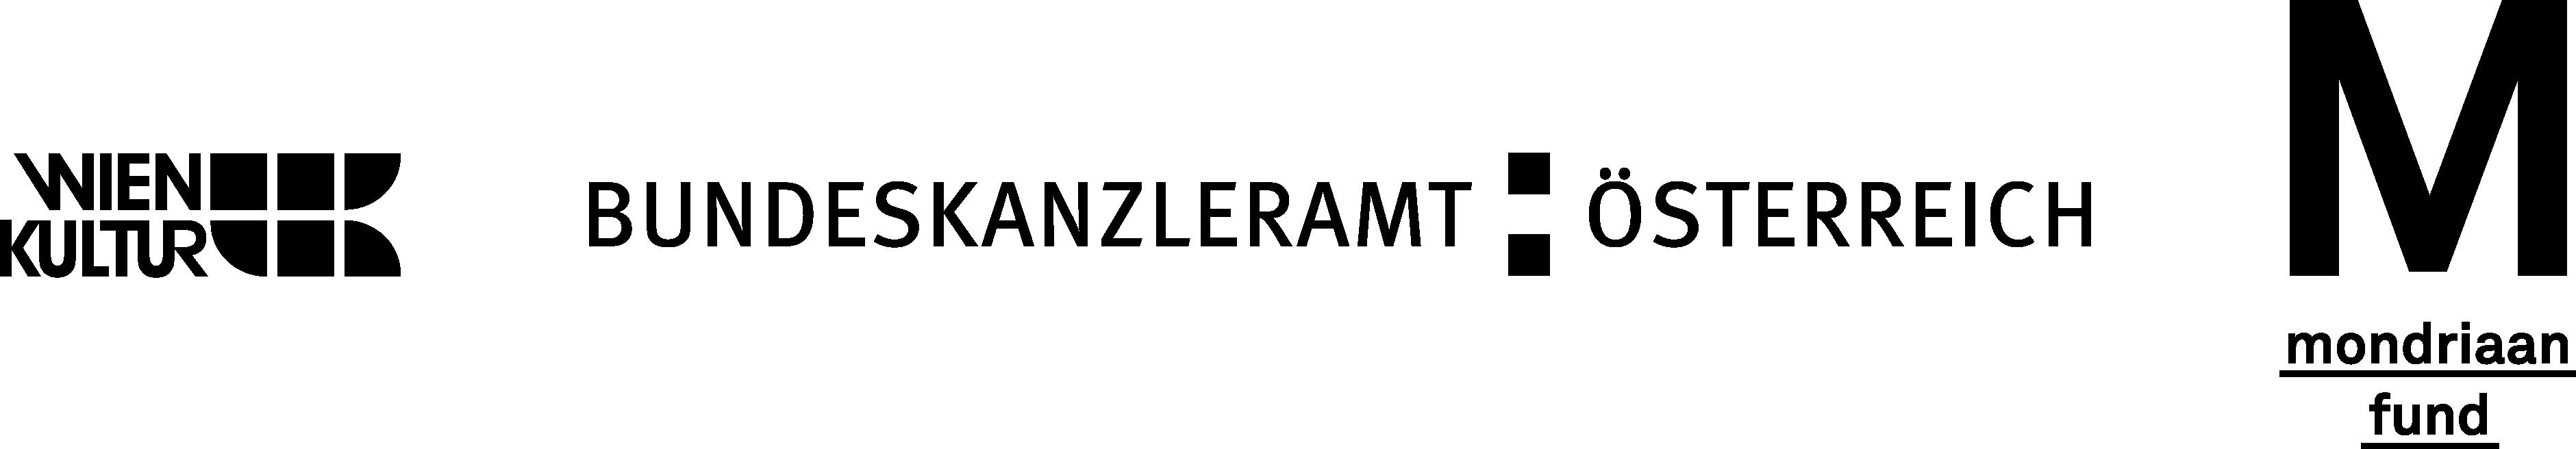 Logoleiste_tight